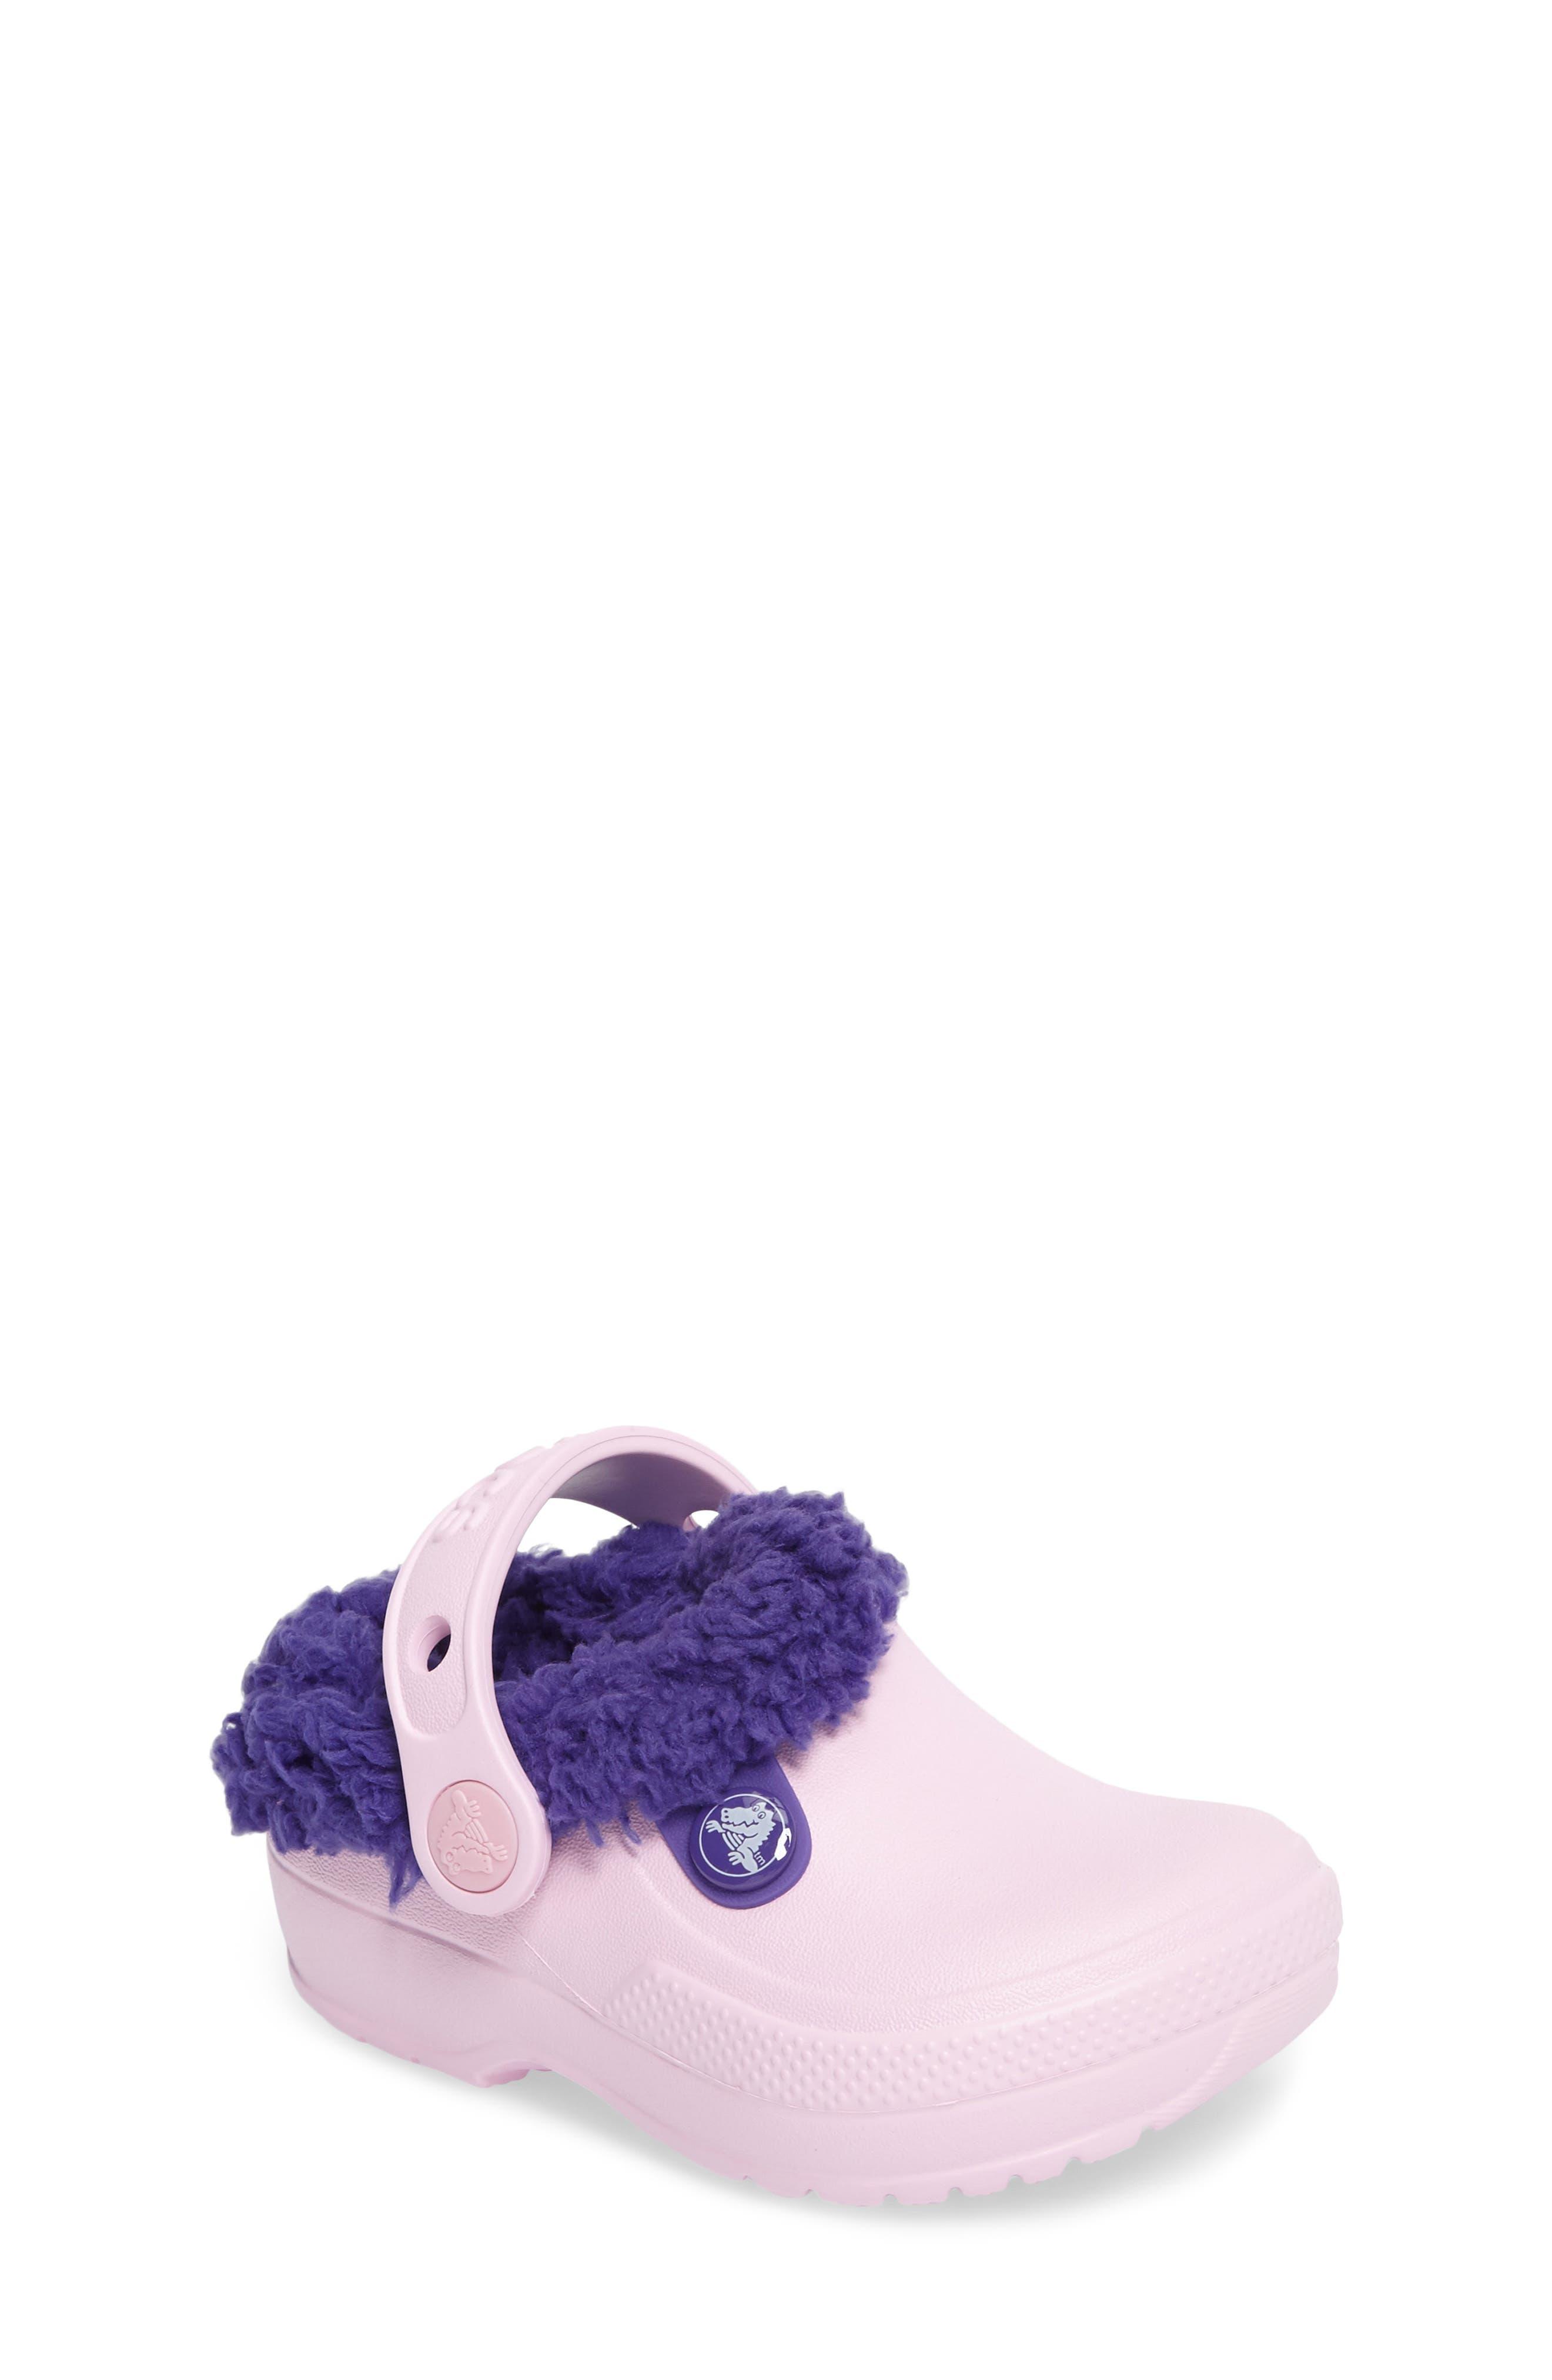 Alternate Image 1 Selected - CROCS™ Classic Blitzen III Faux Fur Clog (Walker, Toddler & Little Kid)